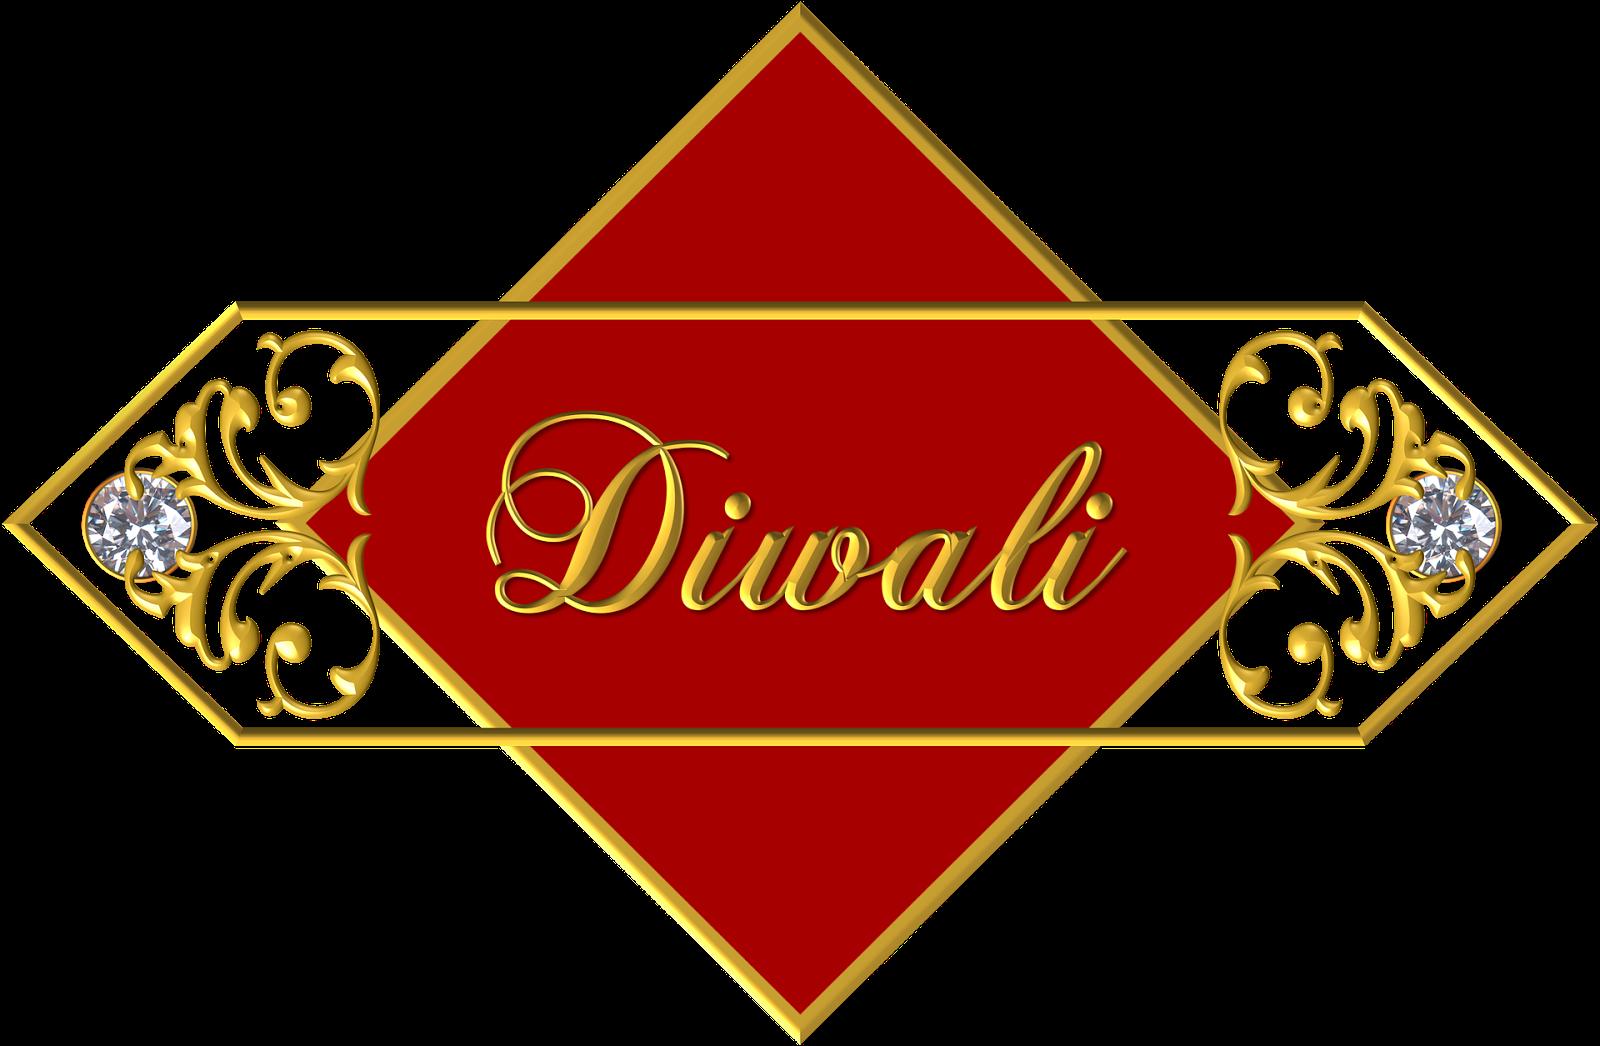 Happy Diwali Wallpapers 2017 Hd Deepavali Background Lakshmi